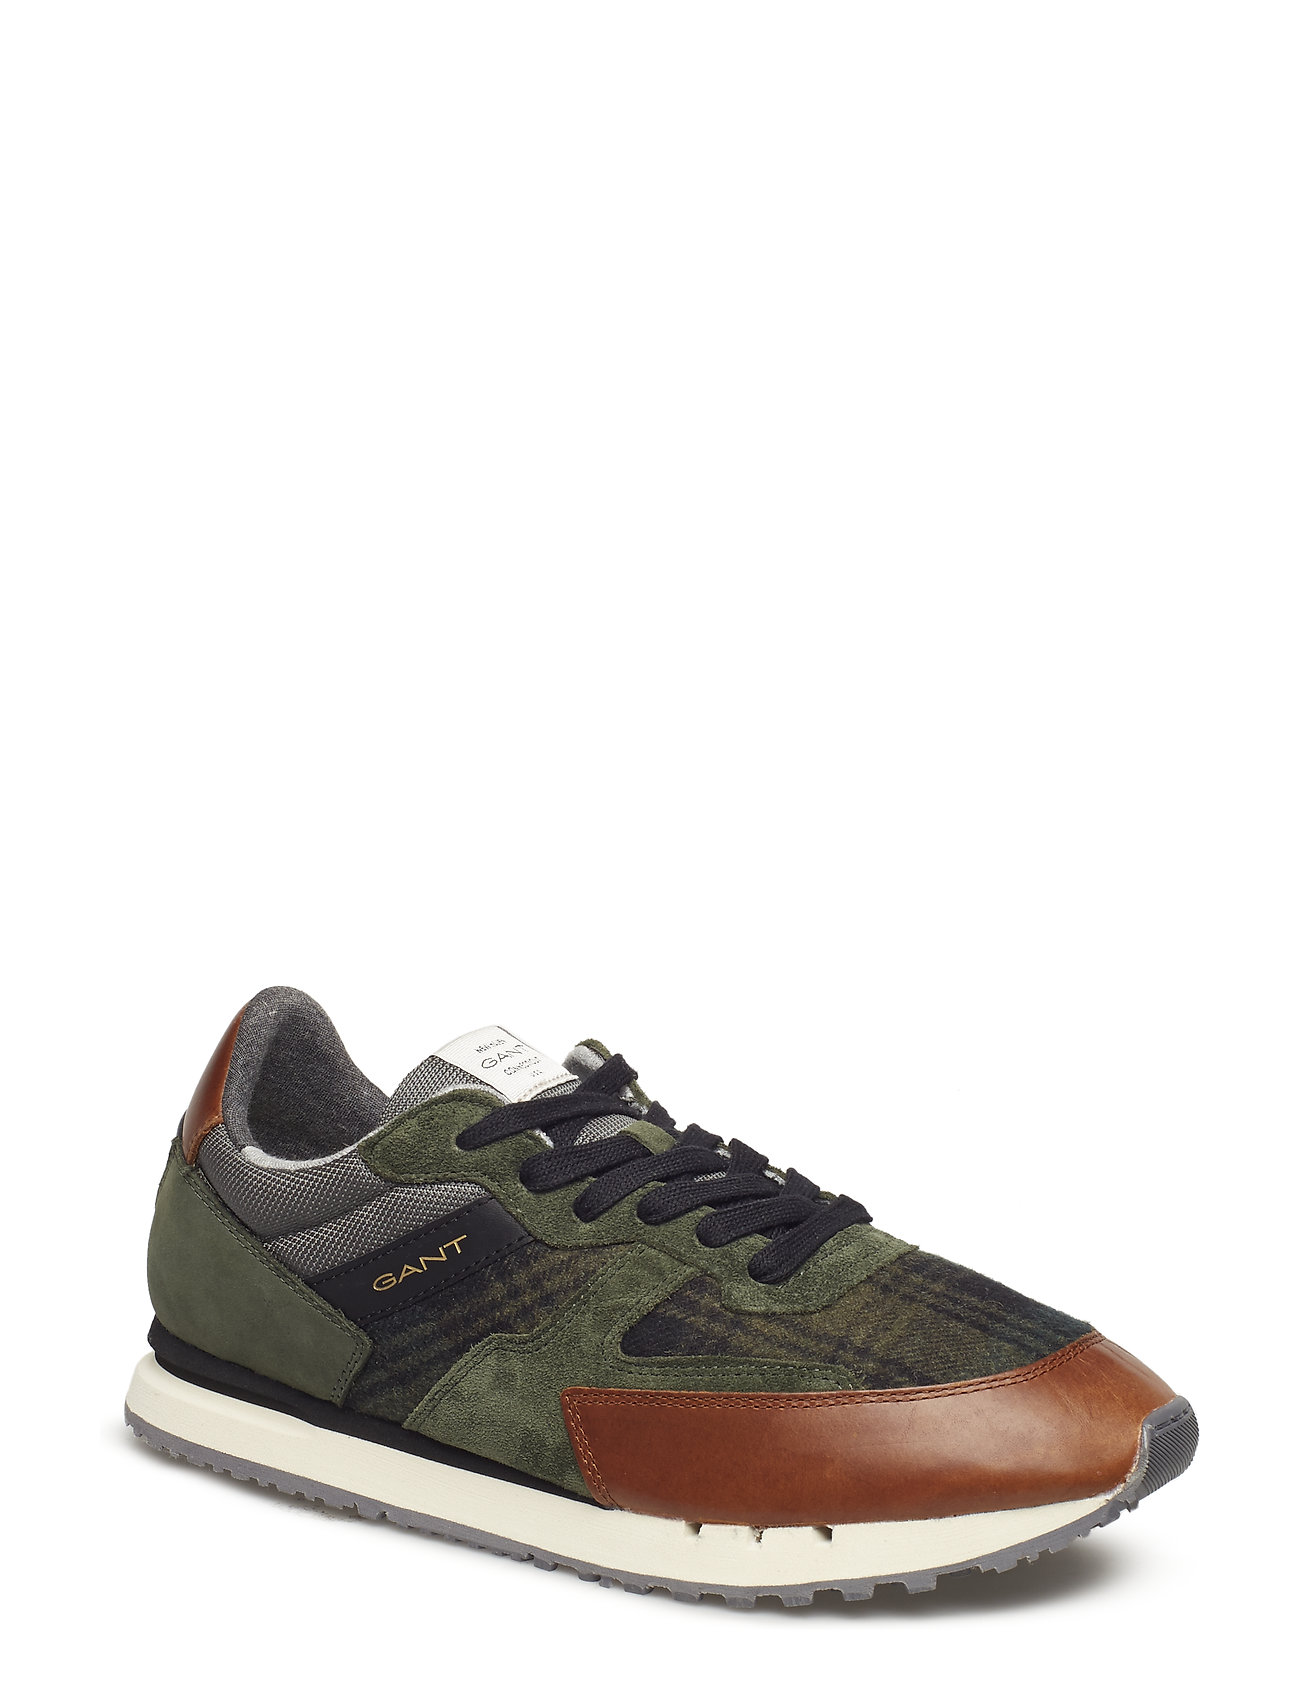 6f6e734b9f9 David Sneaker